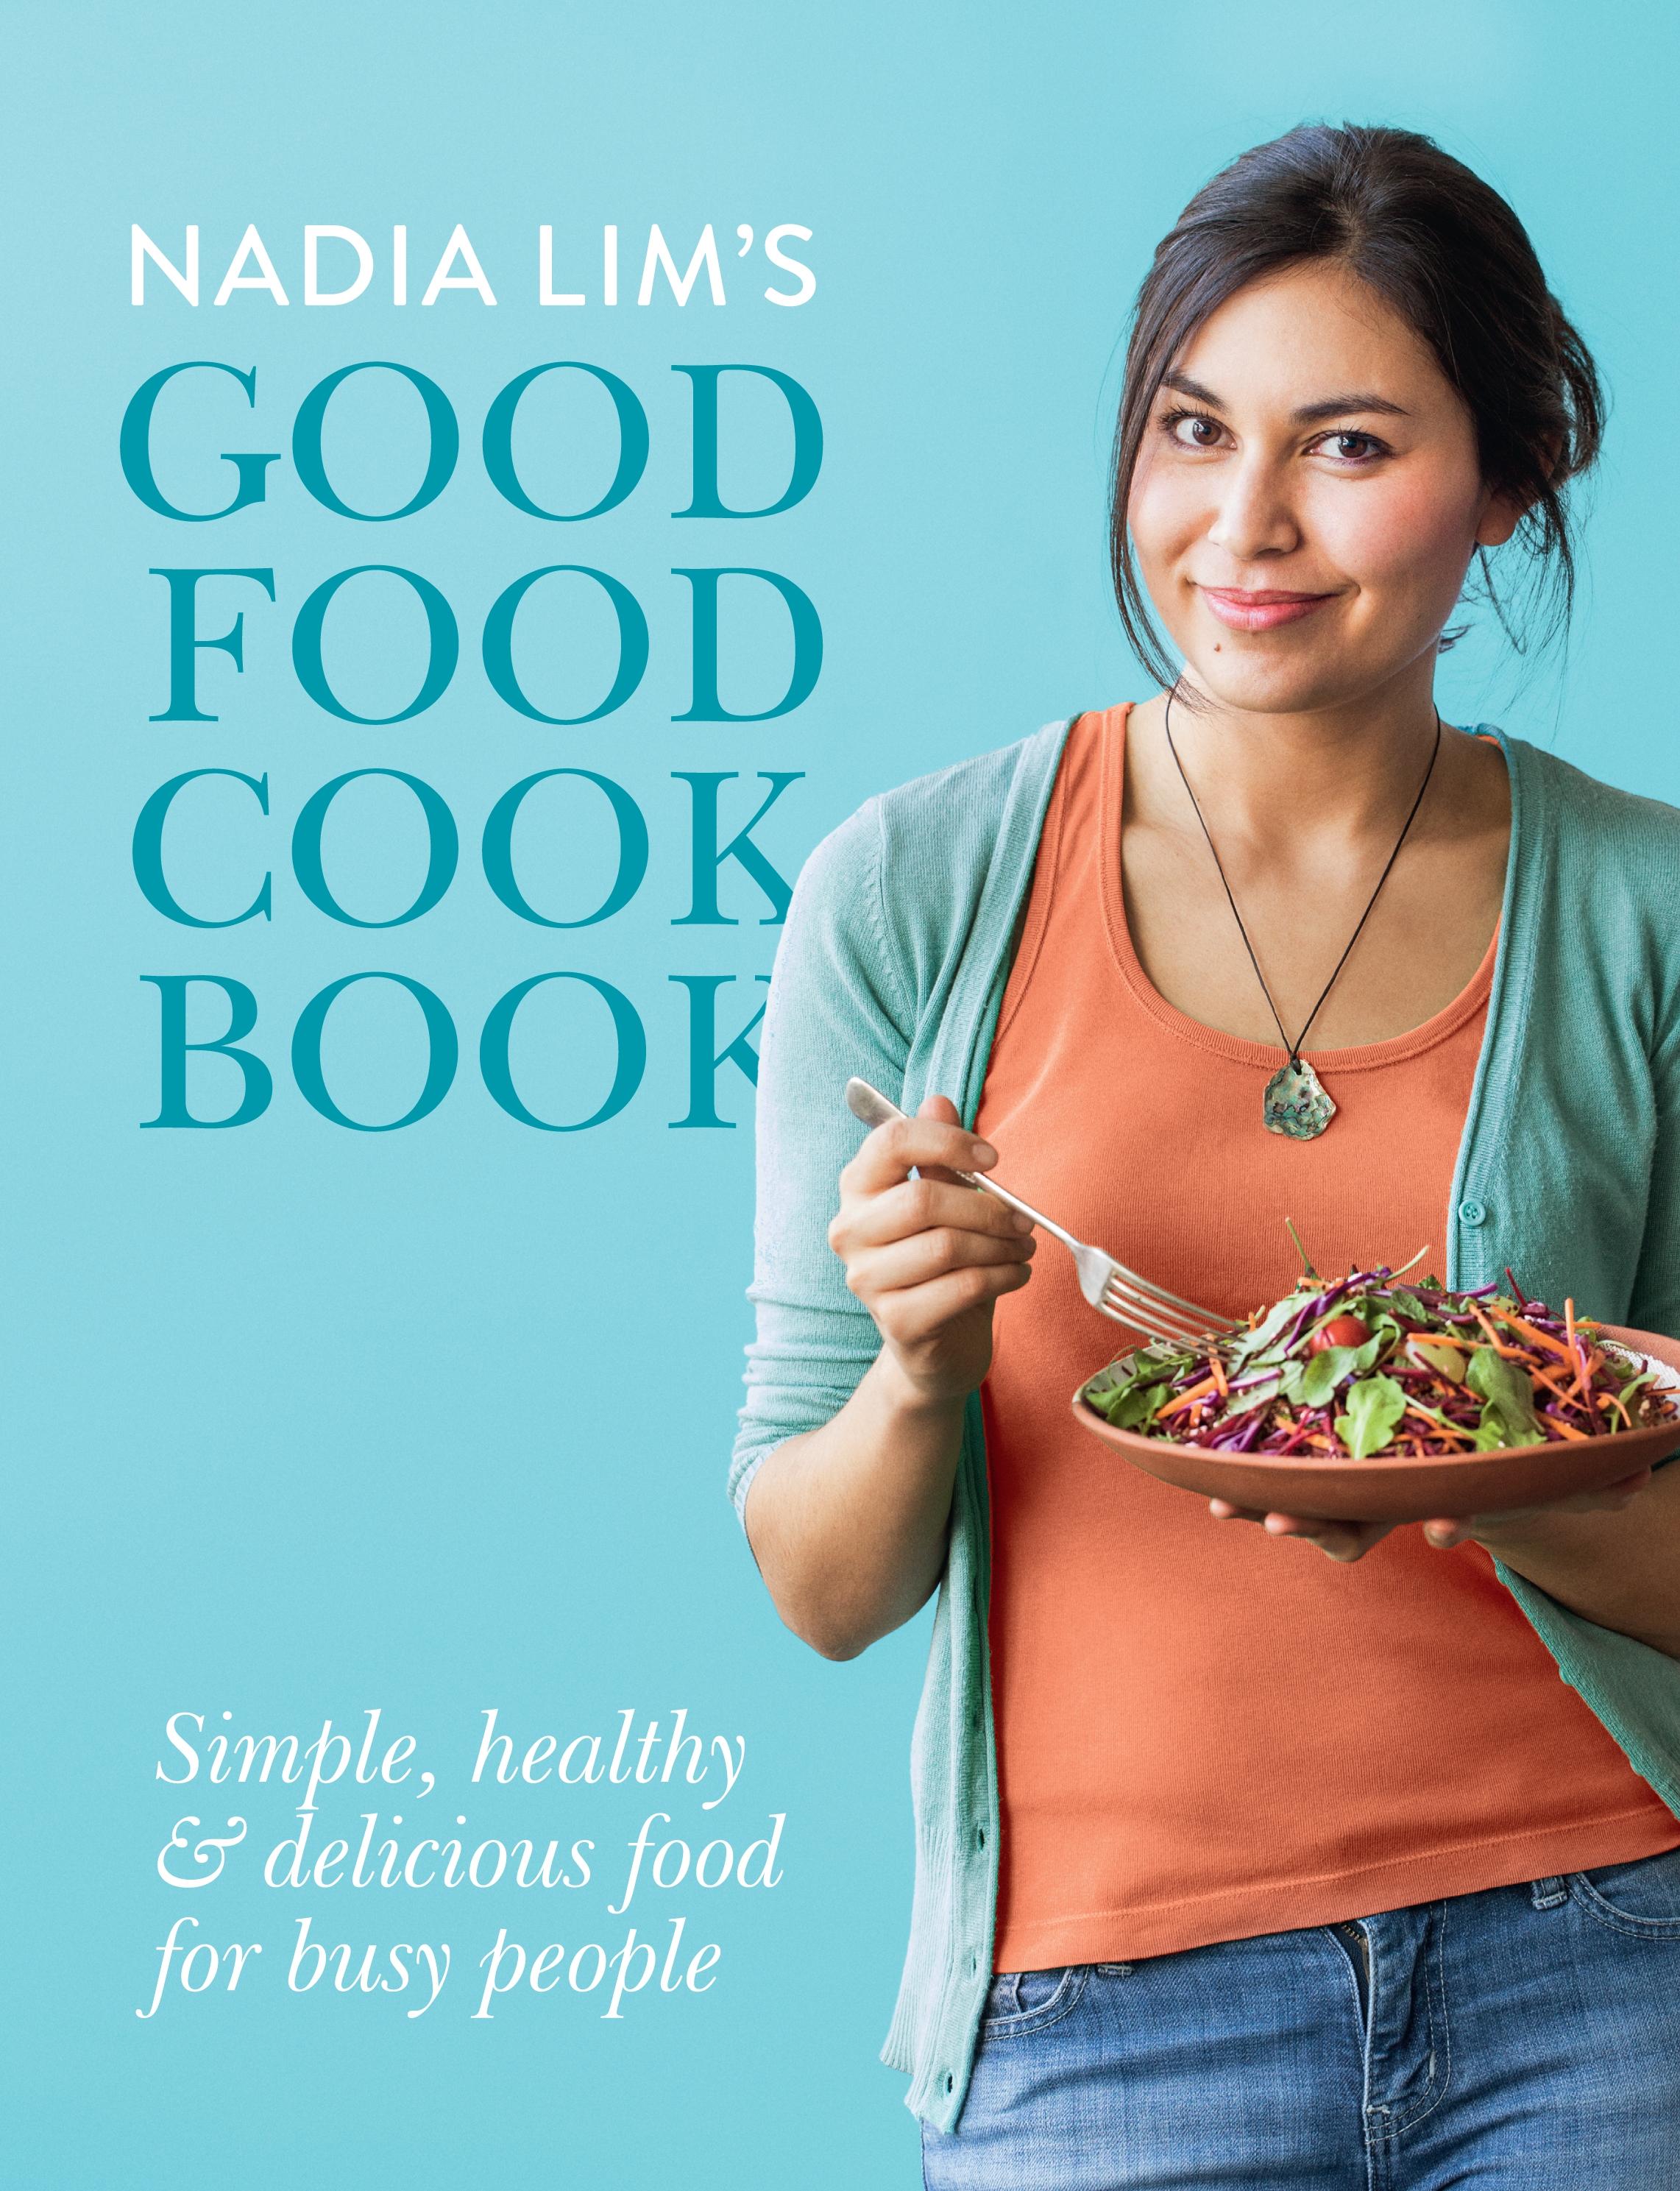 Nadia lims good food cookbook by nadia lim penguin books new hi res cover nadia lims good food cookbook forumfinder Gallery